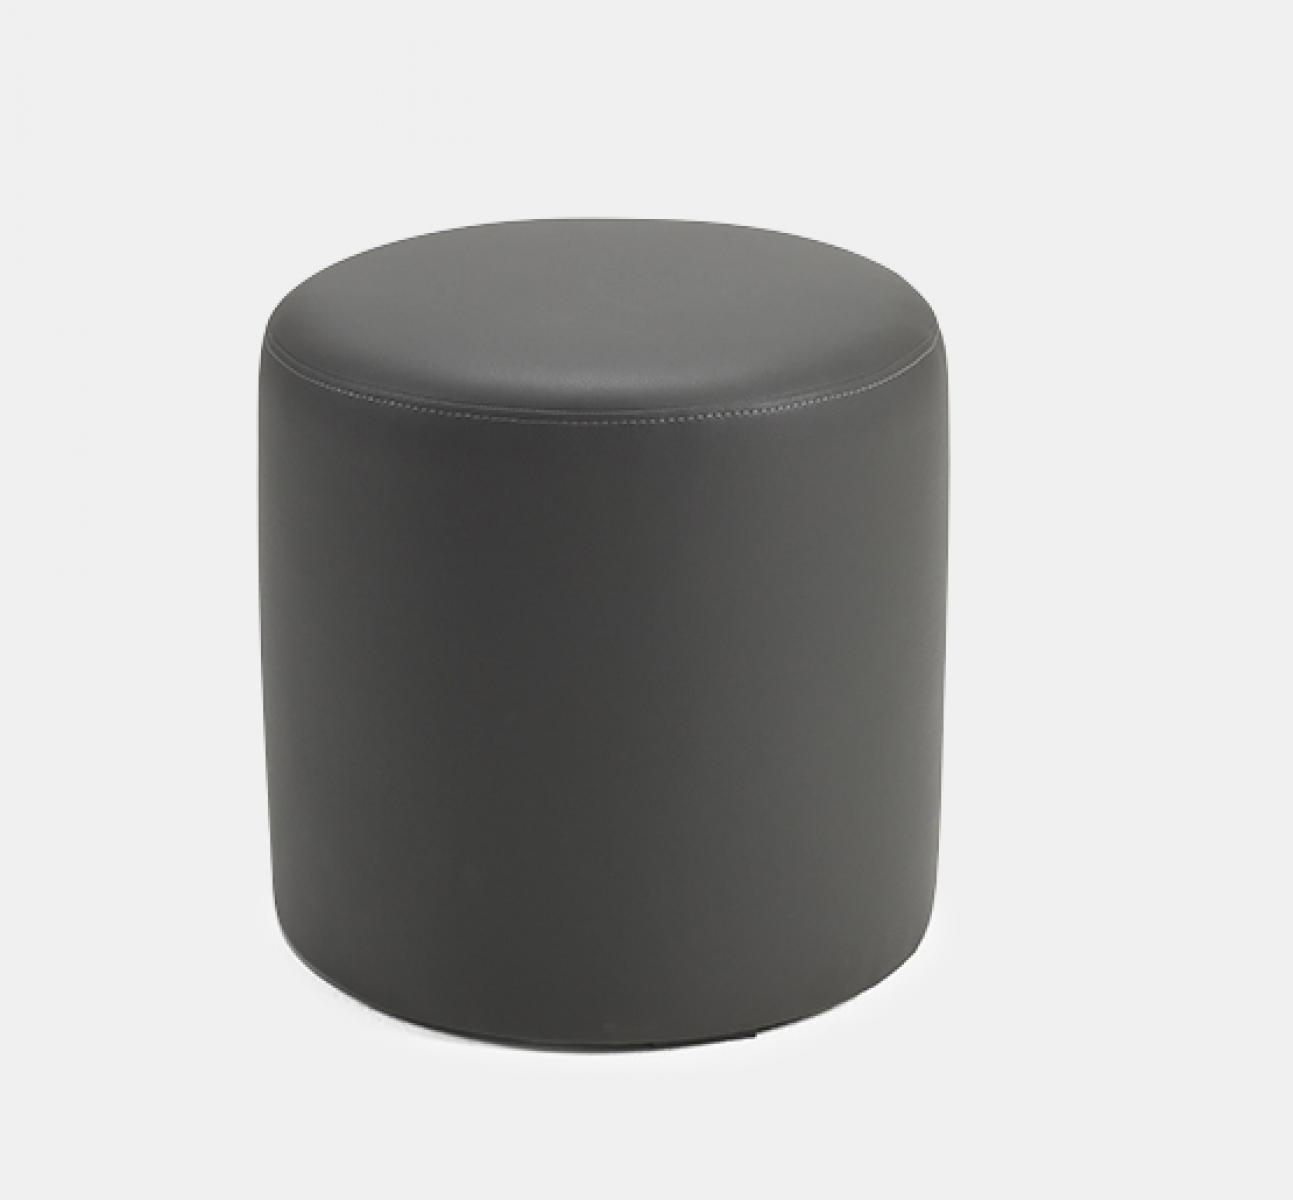 Cylinder Pouff